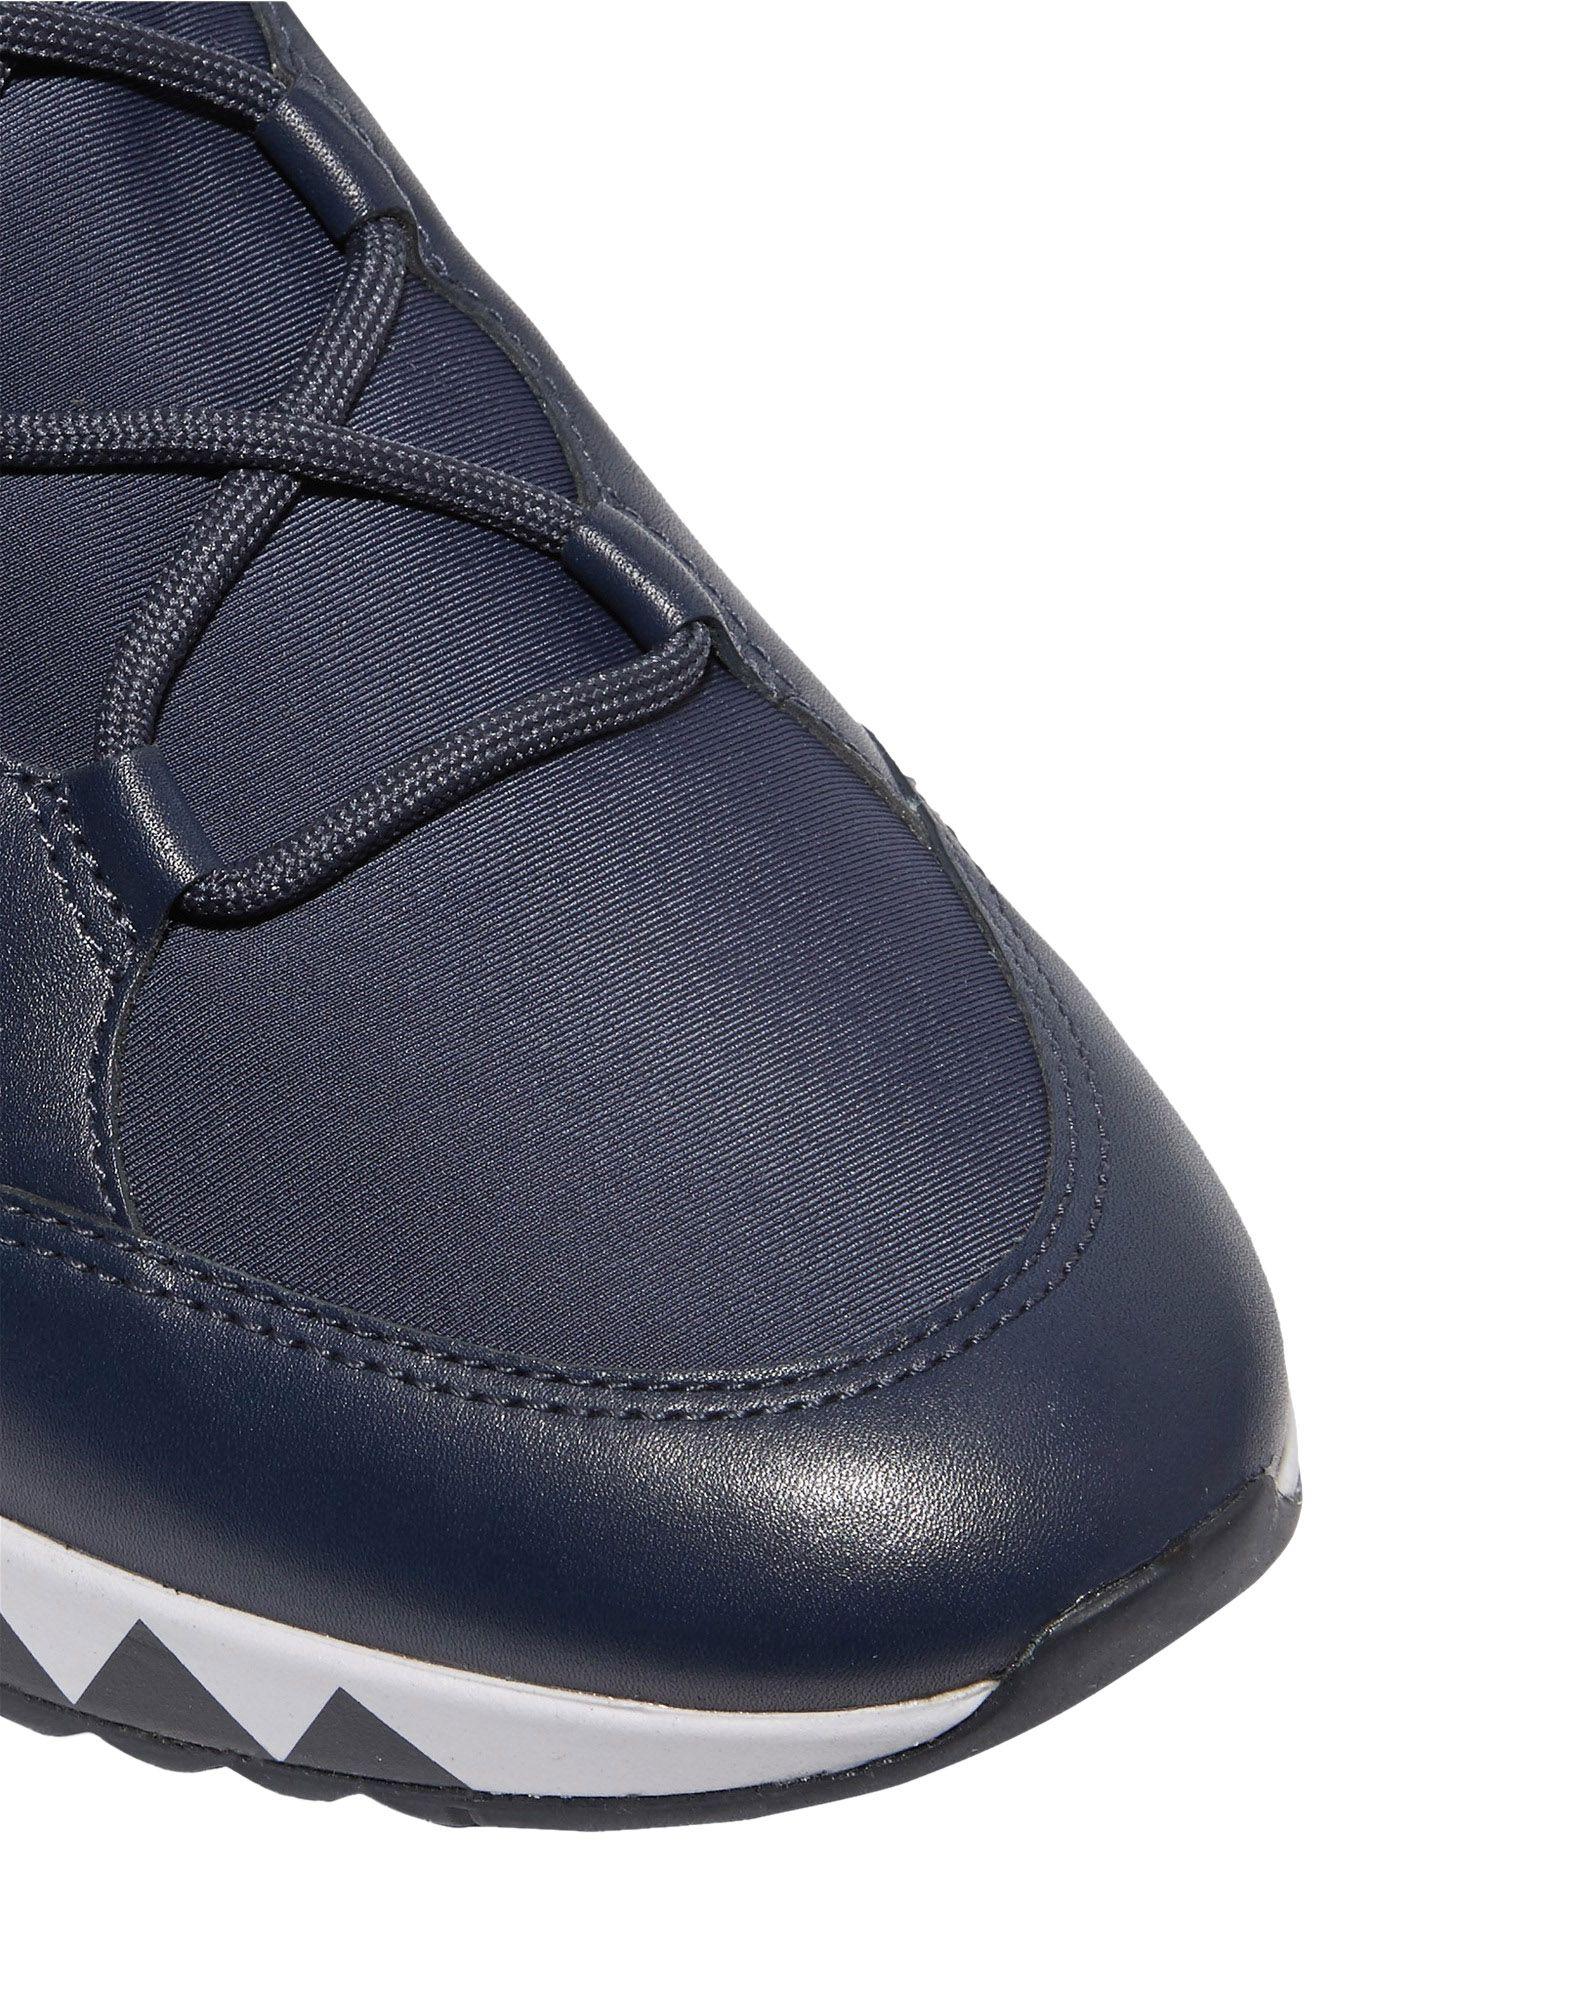 Tory Burch Sneakers Damen Neue  11524518LS Neue Damen Schuhe 607af0